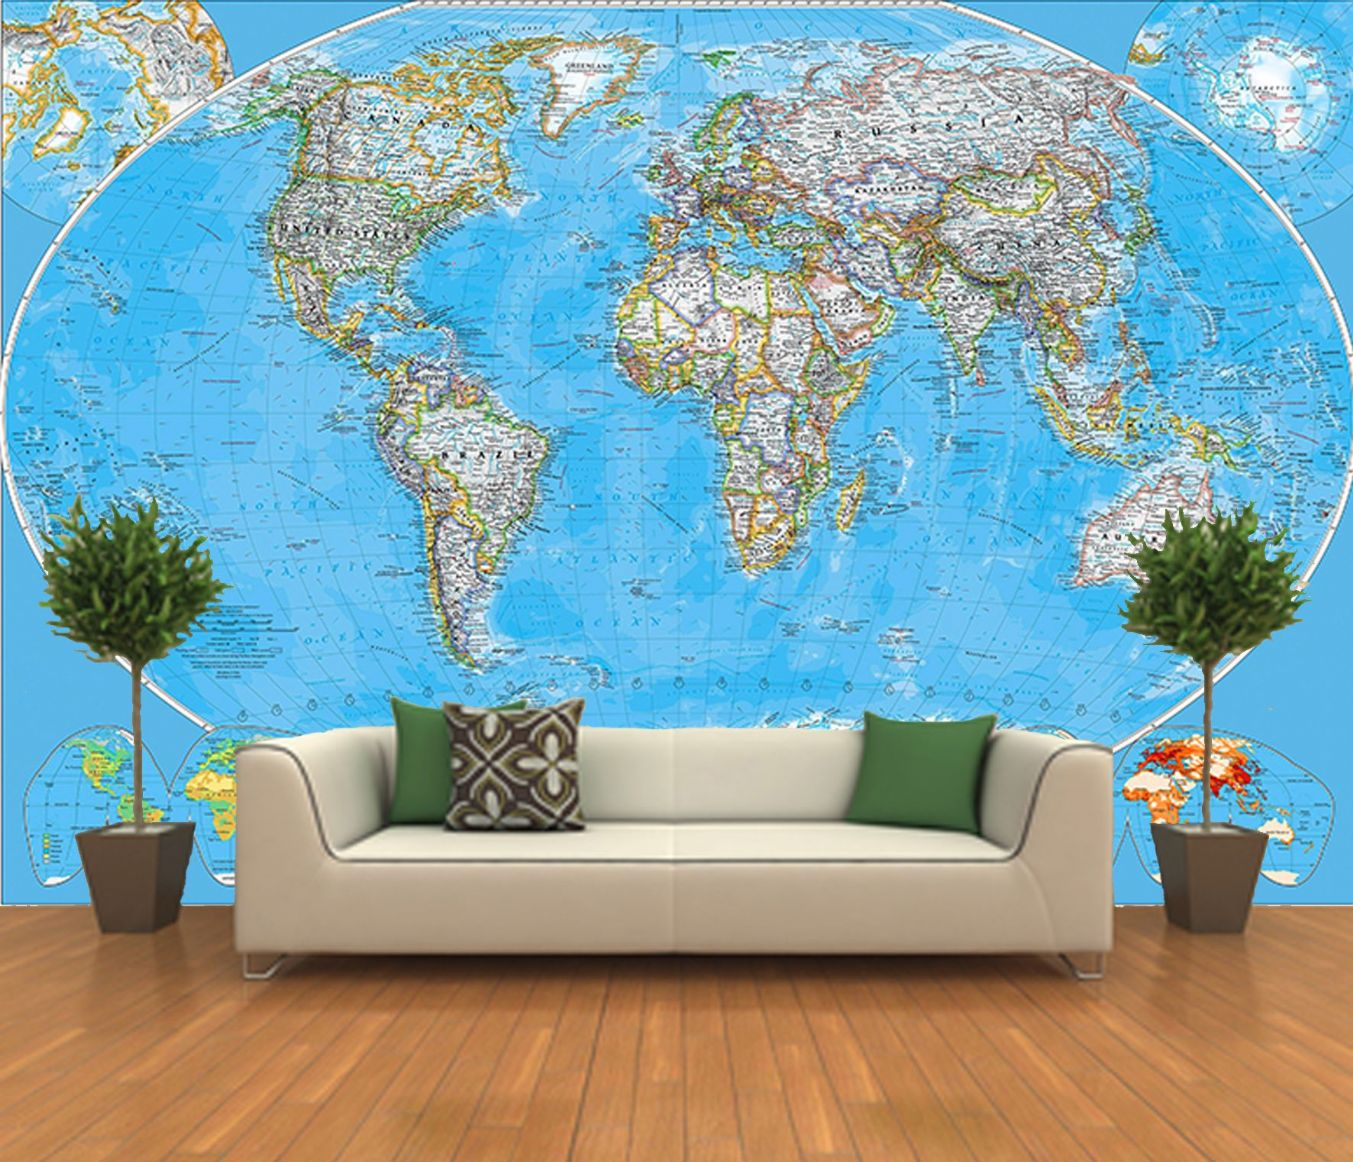 Self Adhesive World Map Decorating photo wall Mural wallpaper peel and 1353x1162